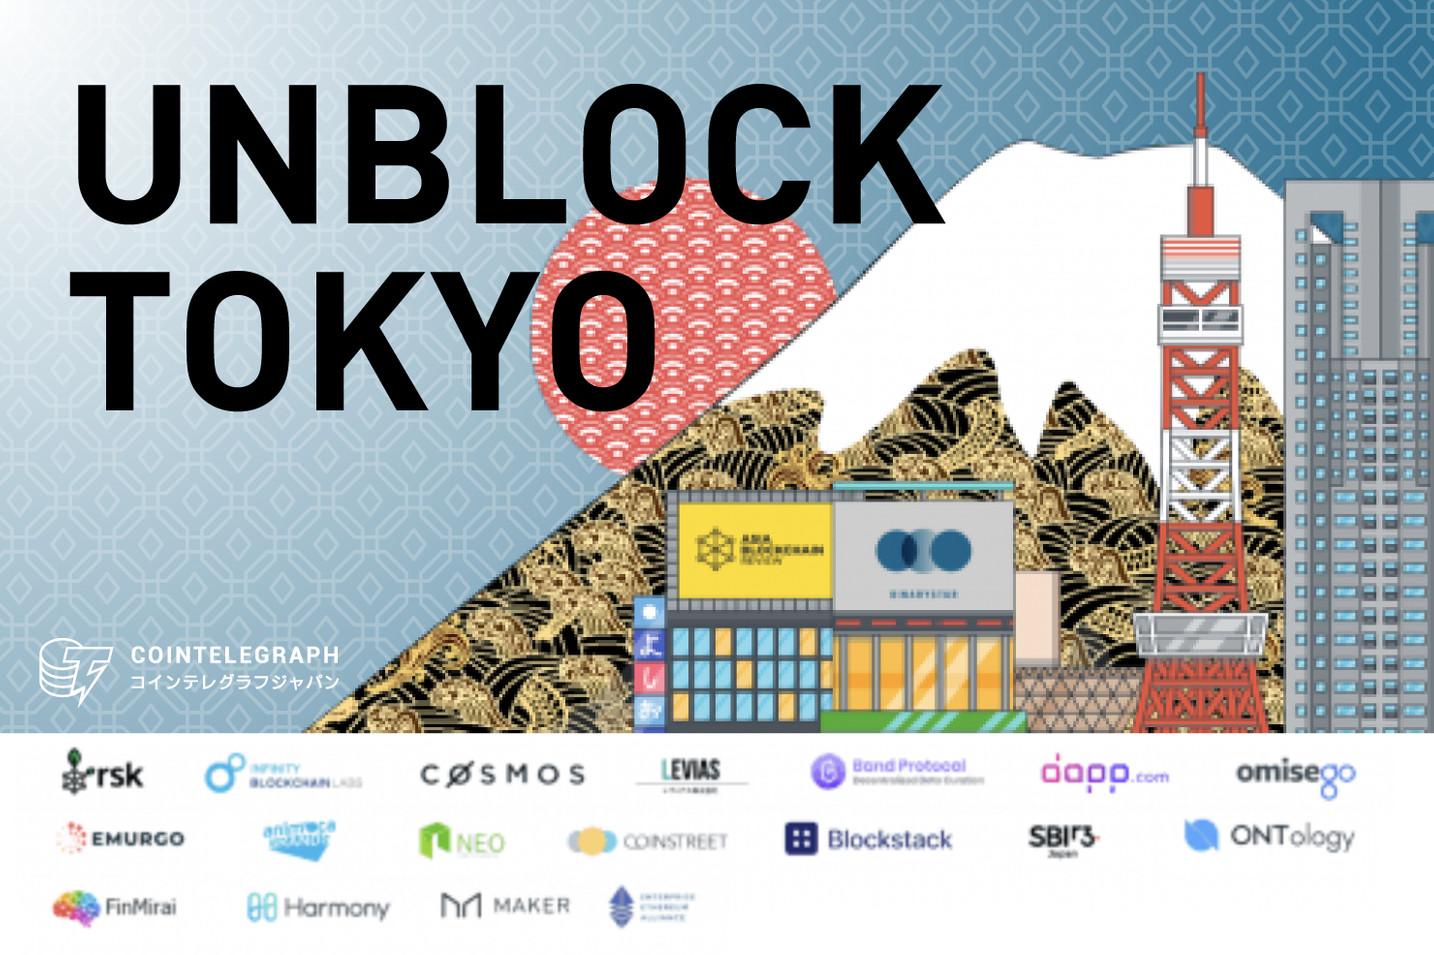 omisego、COSMOS、NEO、など国内外のブロックチェーン業界の有識者が登壇する「UNBLOCK TOKYO」が10月5日(土)に開催!